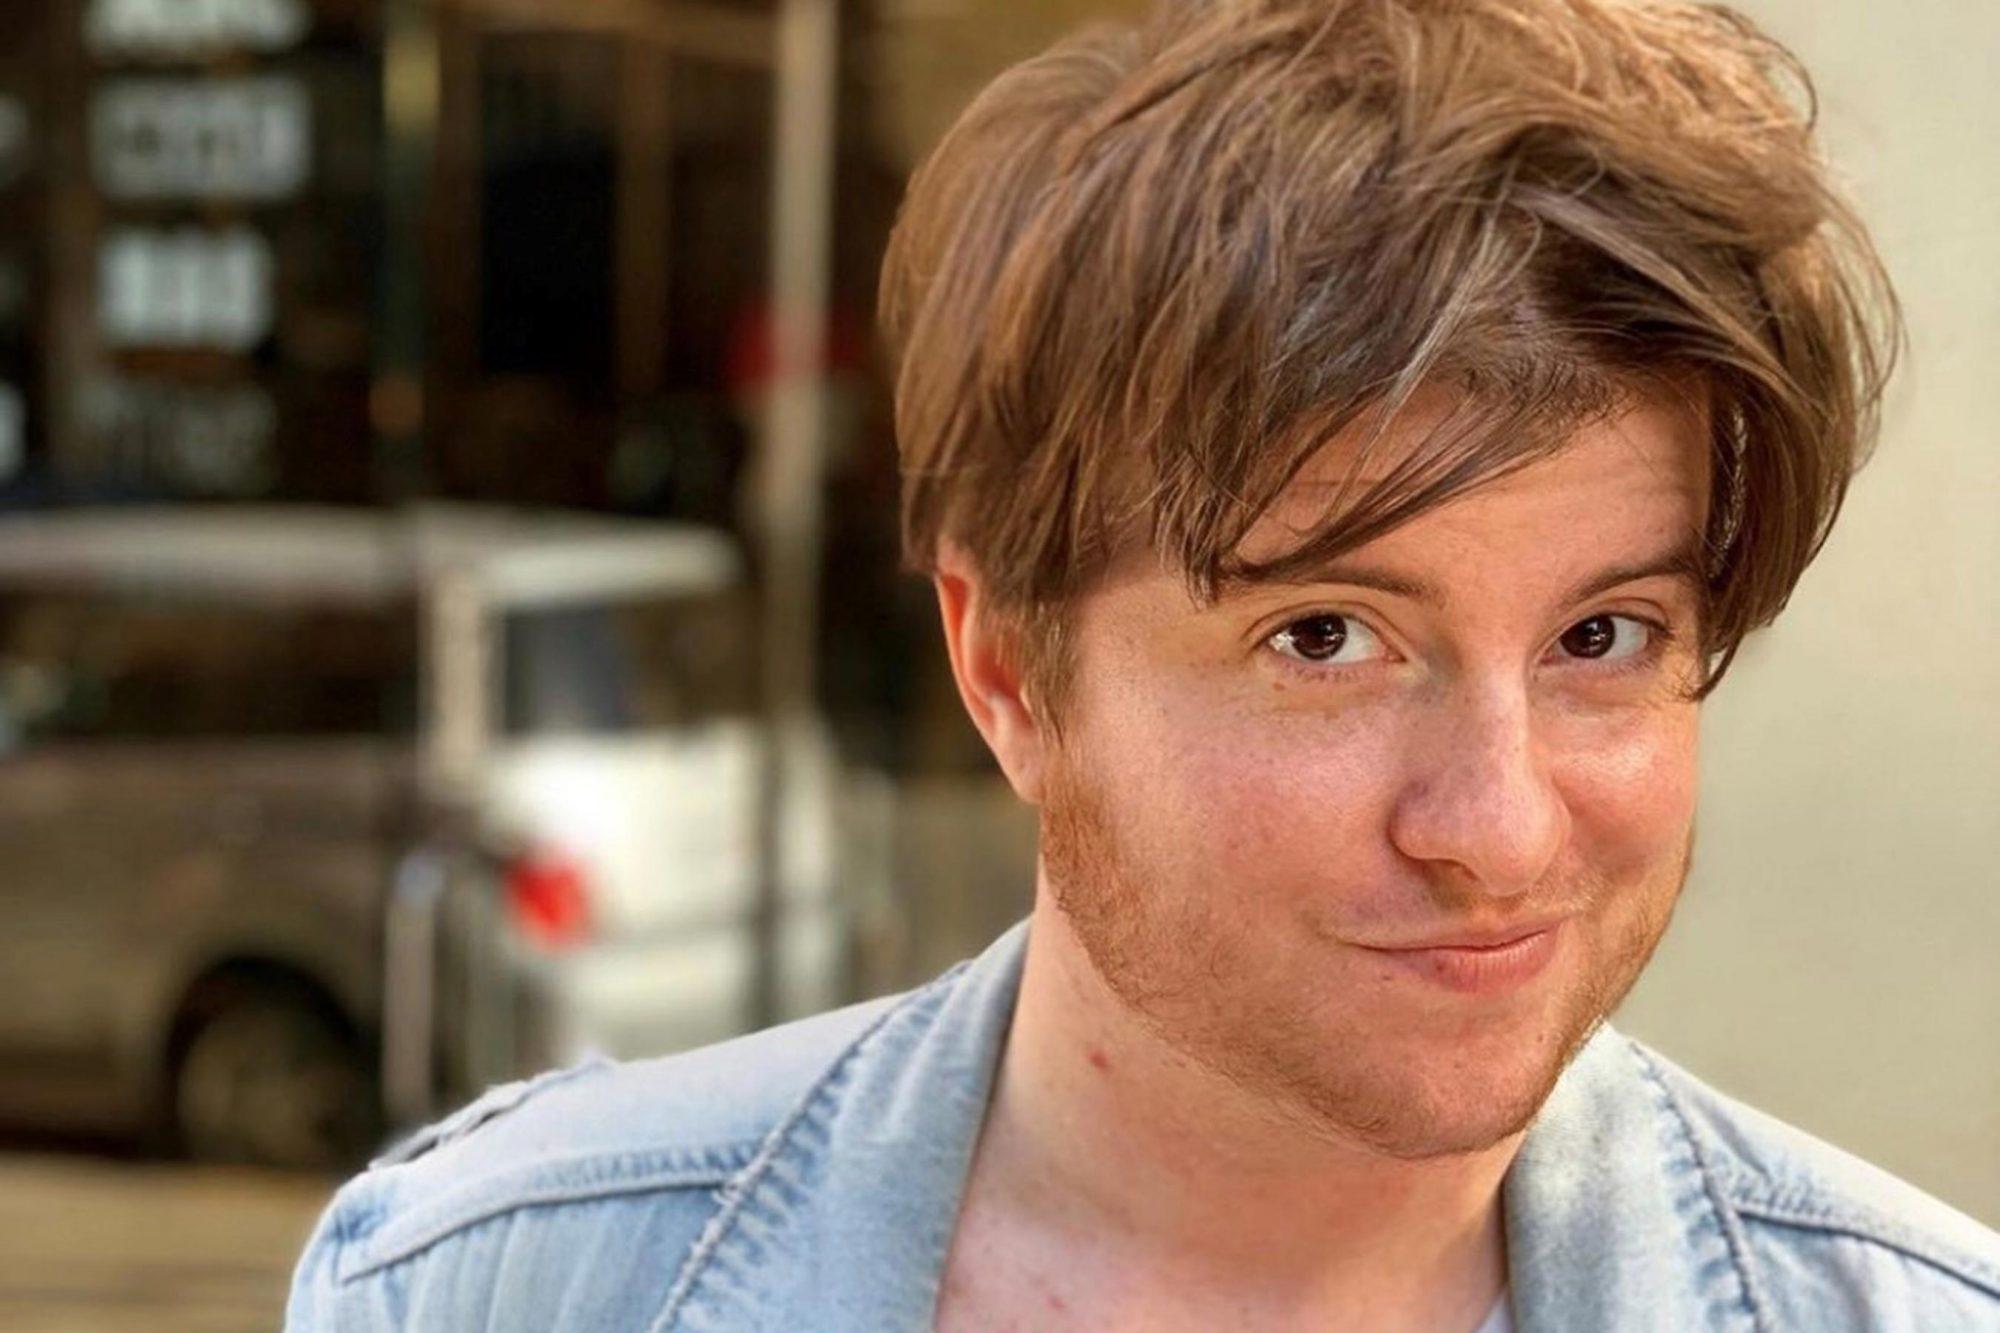 Daniel-Mallory-Ortberg-Author-Photo